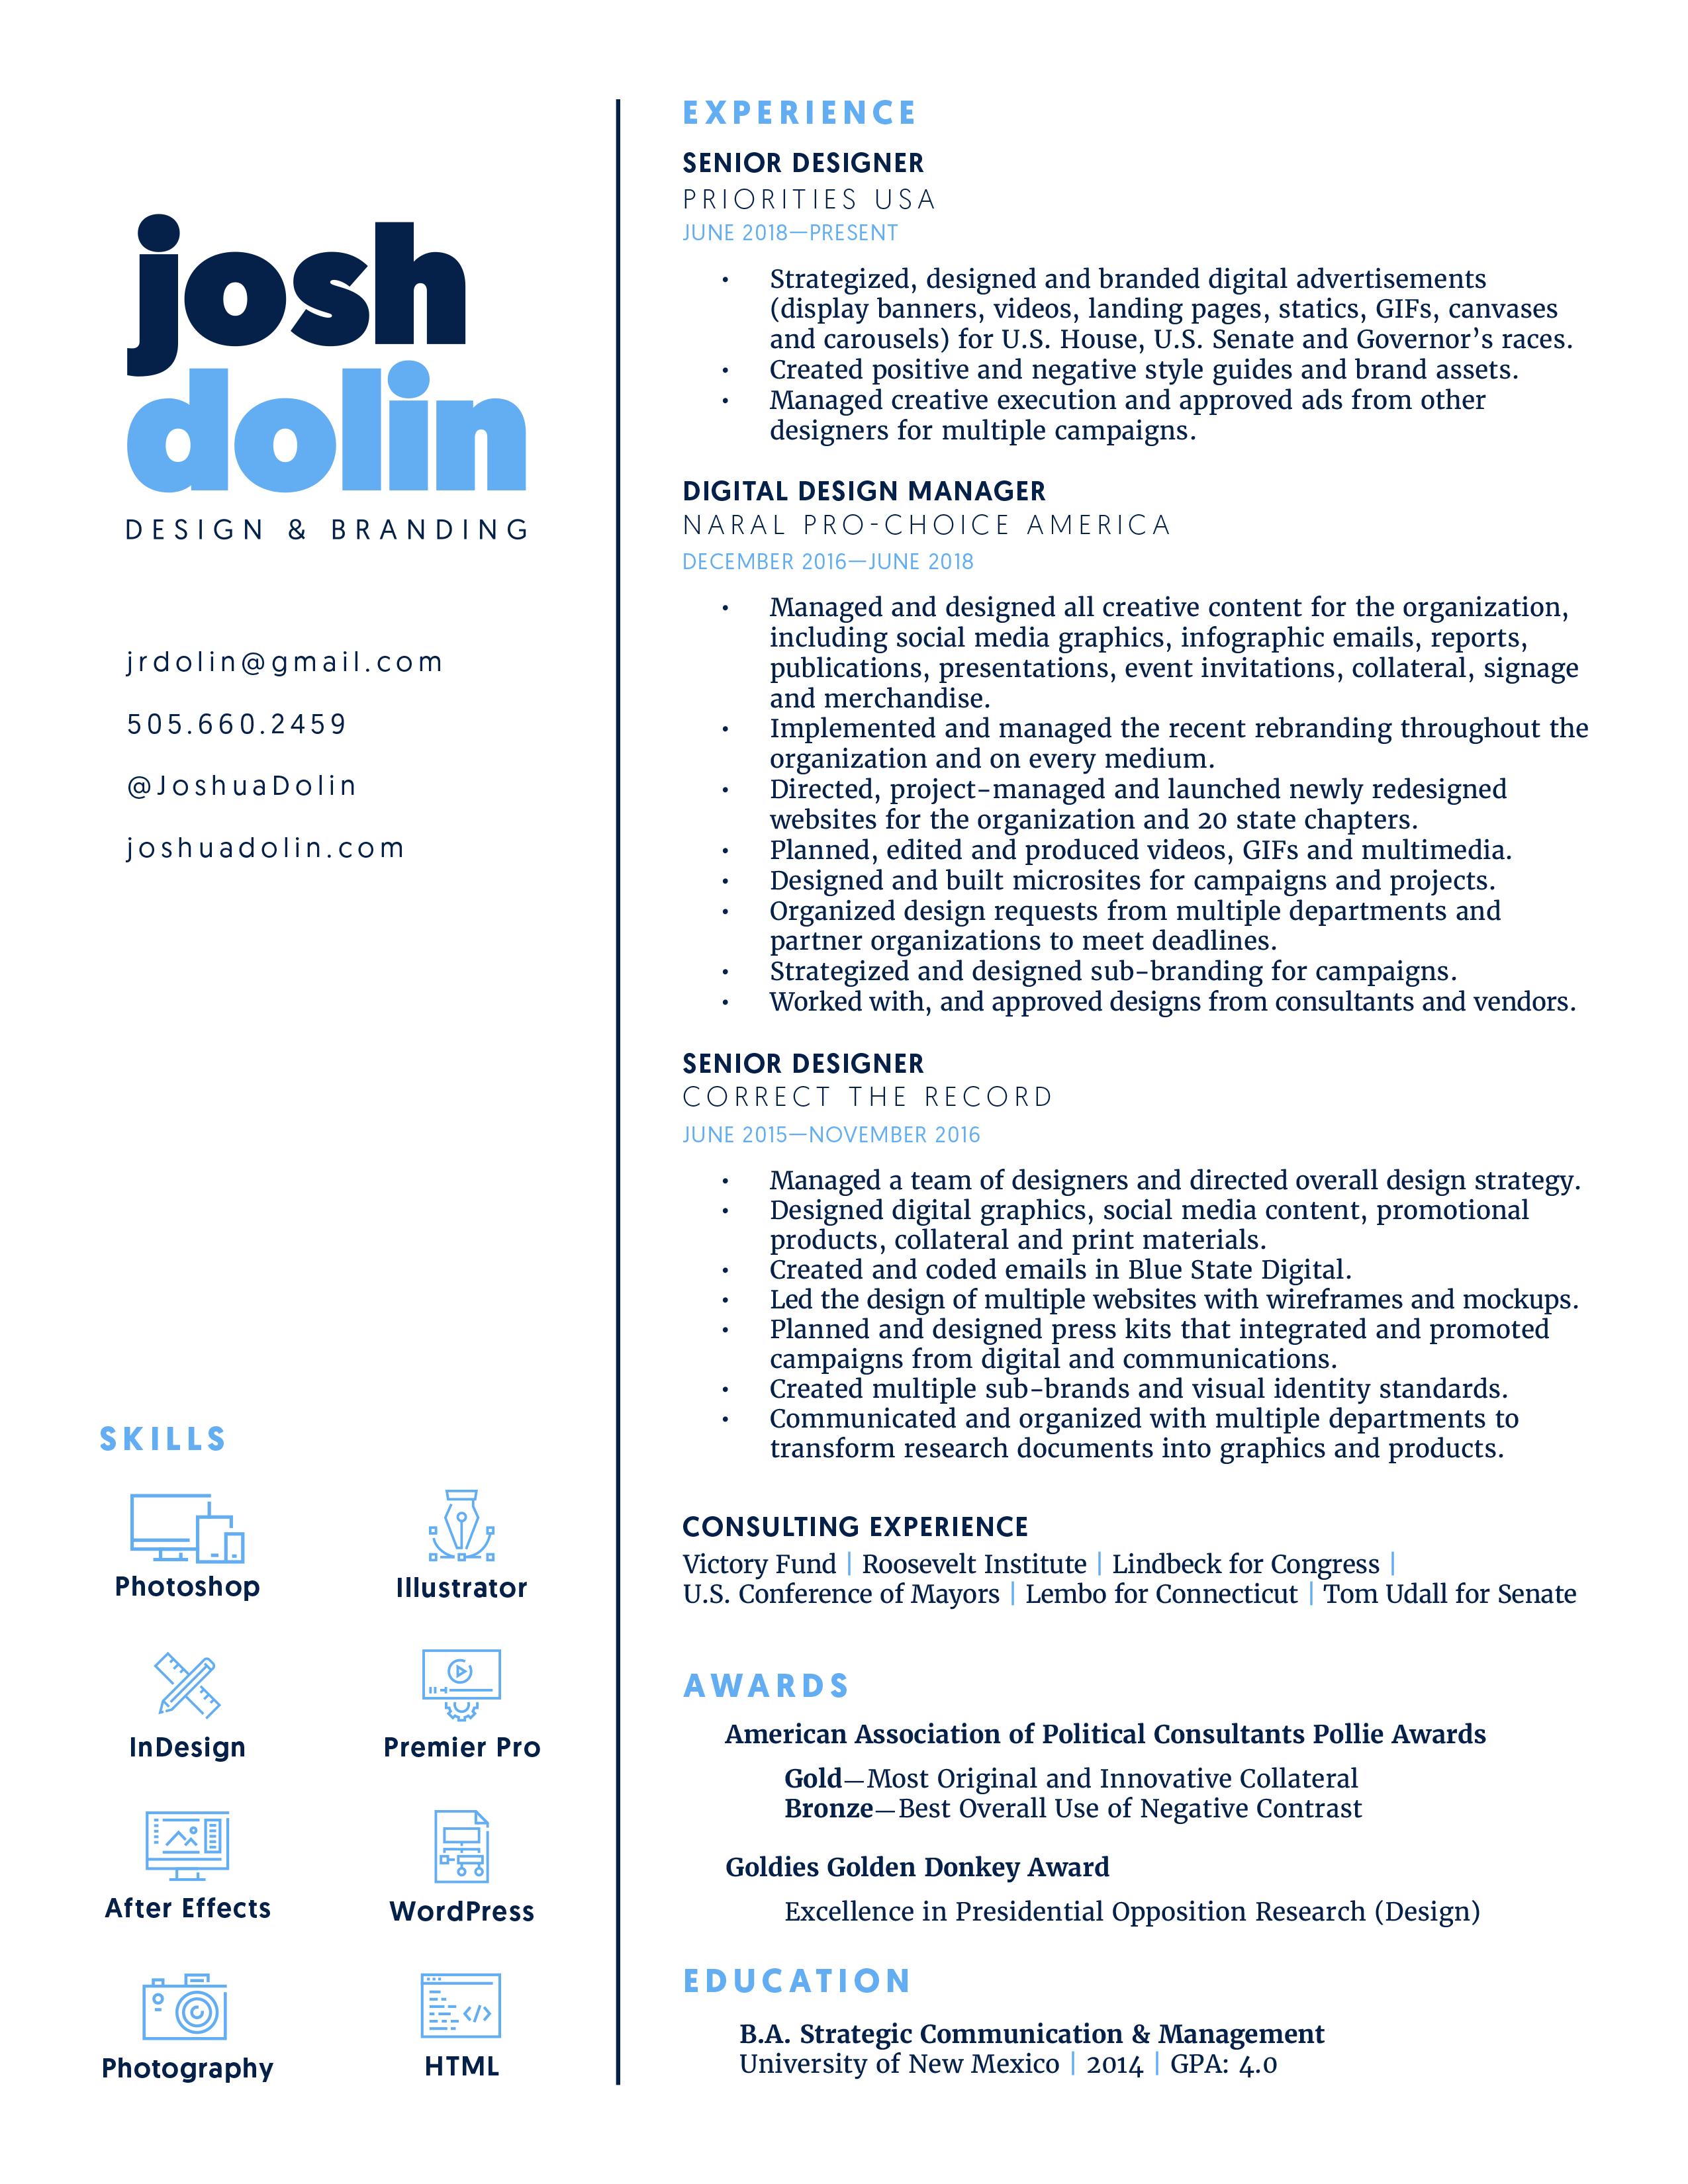 josh-dolin_resume